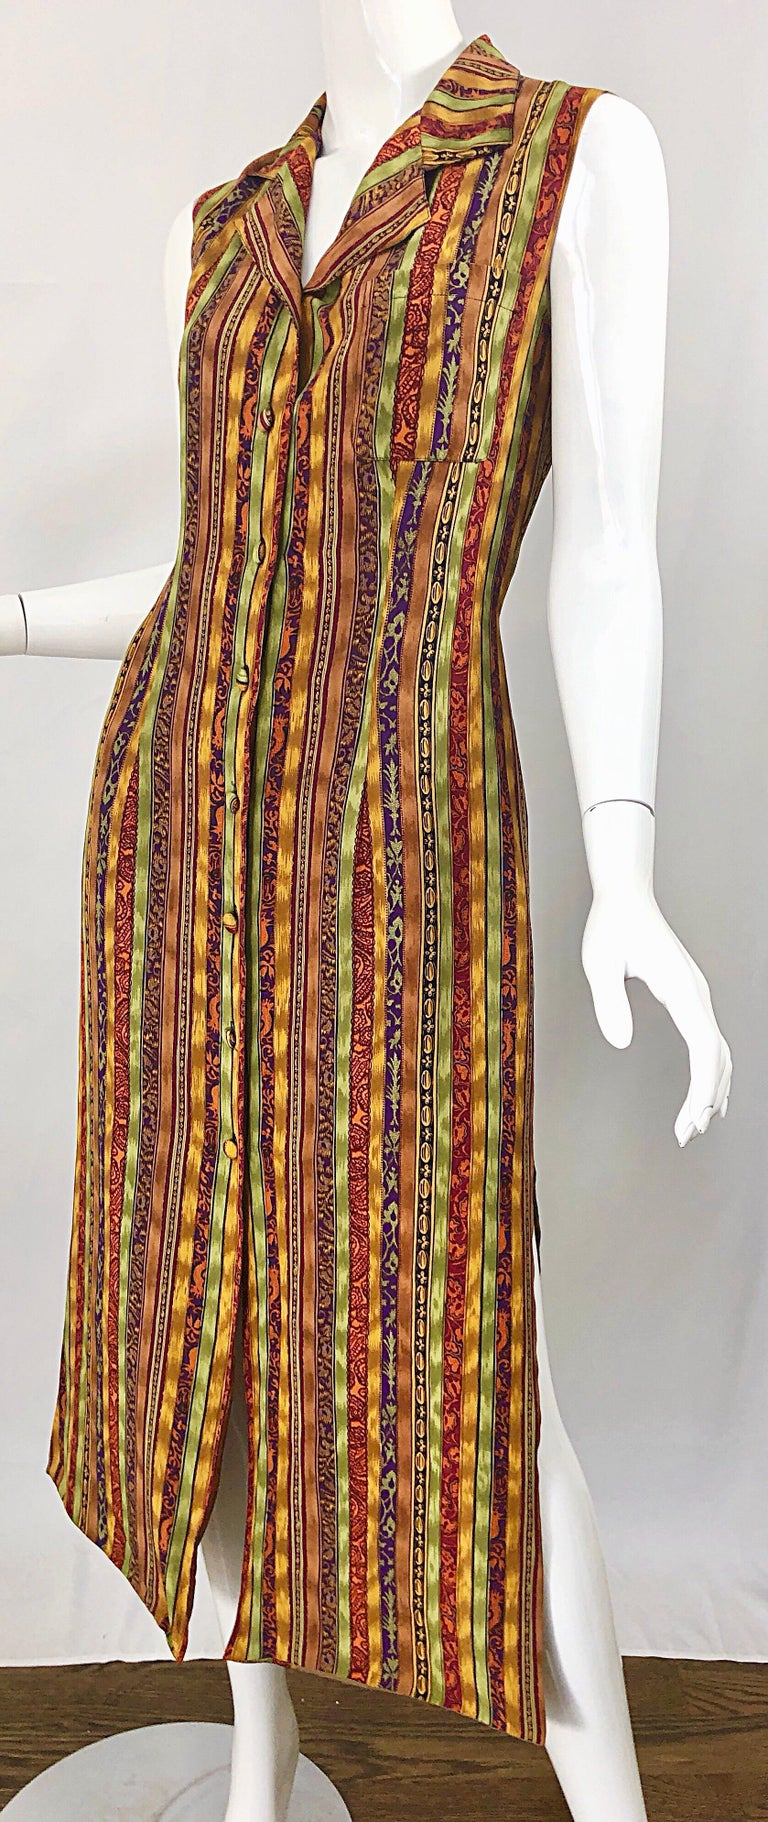 1990s Boho Silk Warm Color Vertical Aztec Stripe Sleeveless 90s Midi Shirt Dress For Sale 7